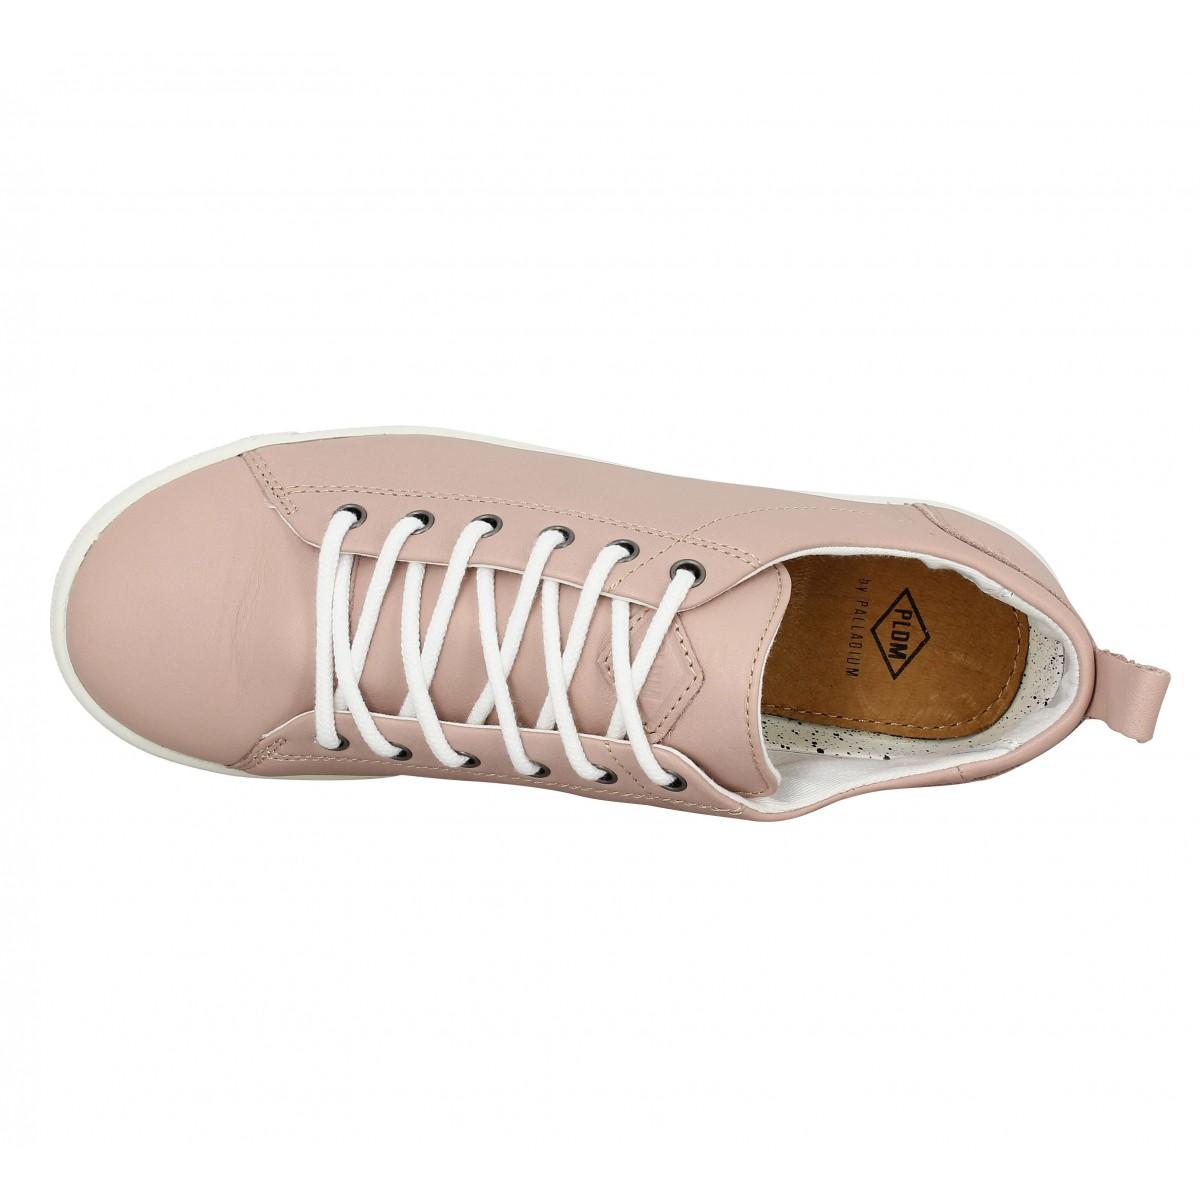 091ead65270882 Pldm by palladium bel nca cuir femme rose femme   Fanny chaussures